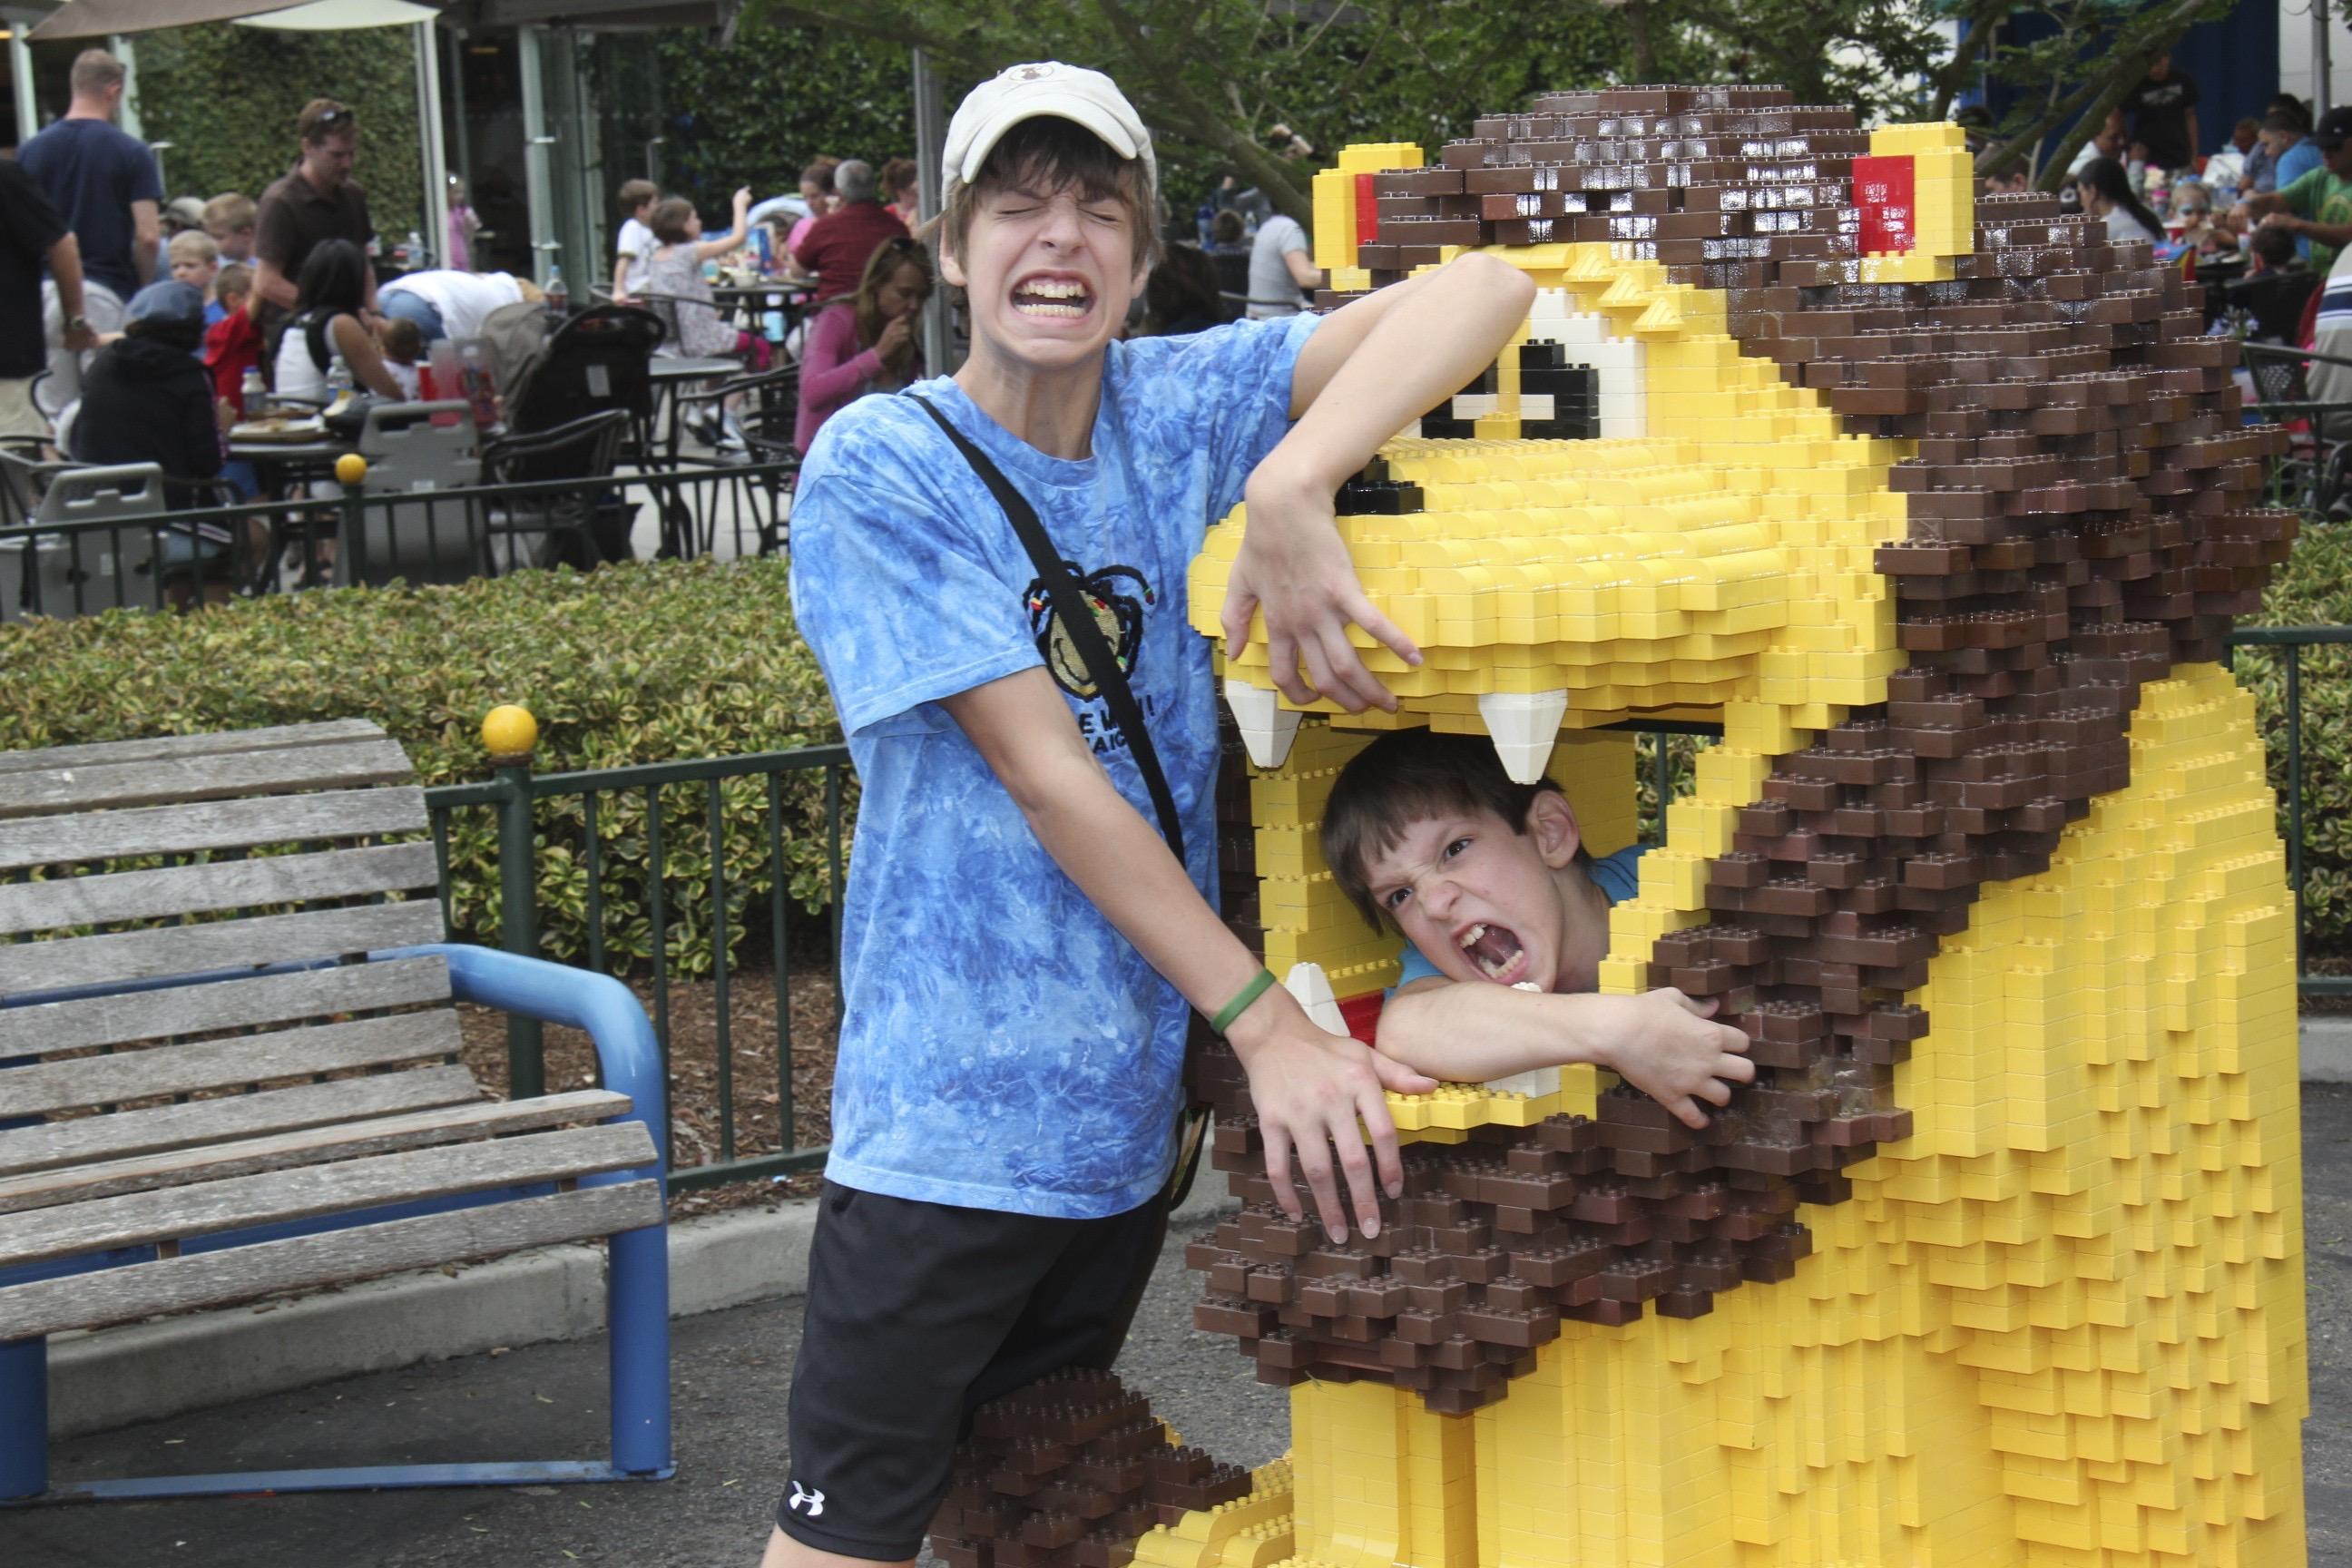 Fun for Fellow Lego Fans